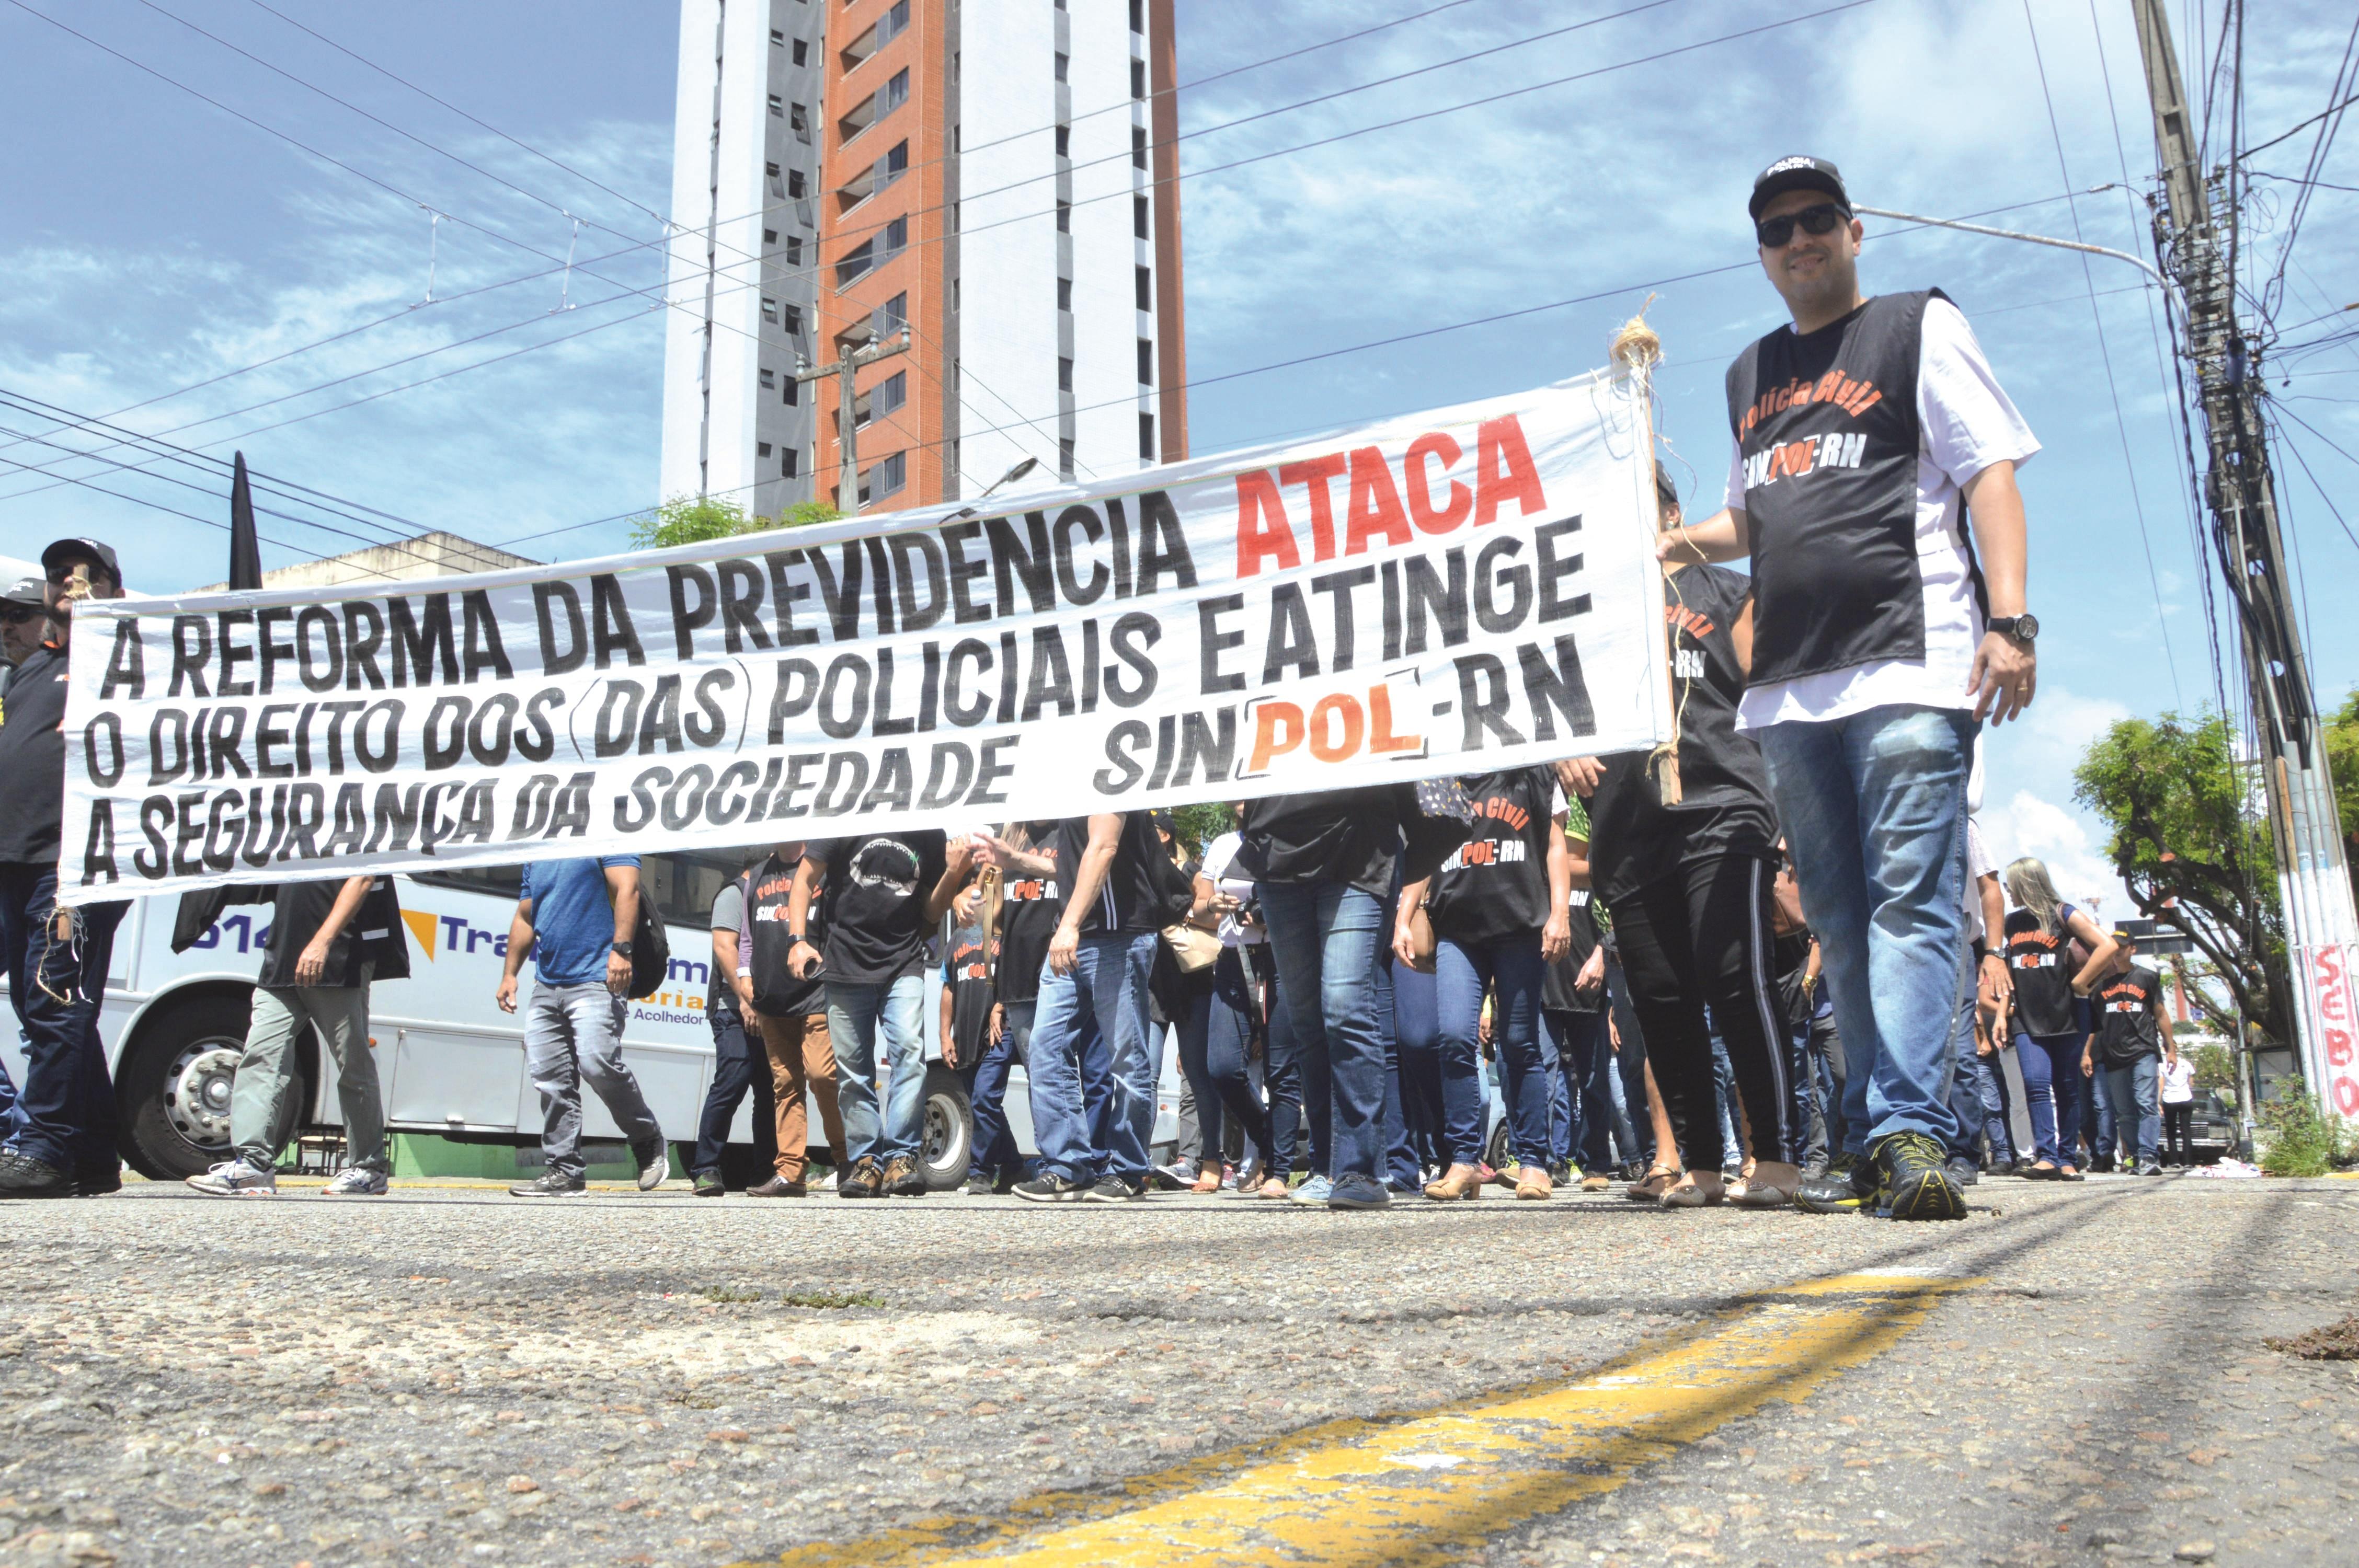 Protesto do SinpolRN Contra Reforma da Previdência 40